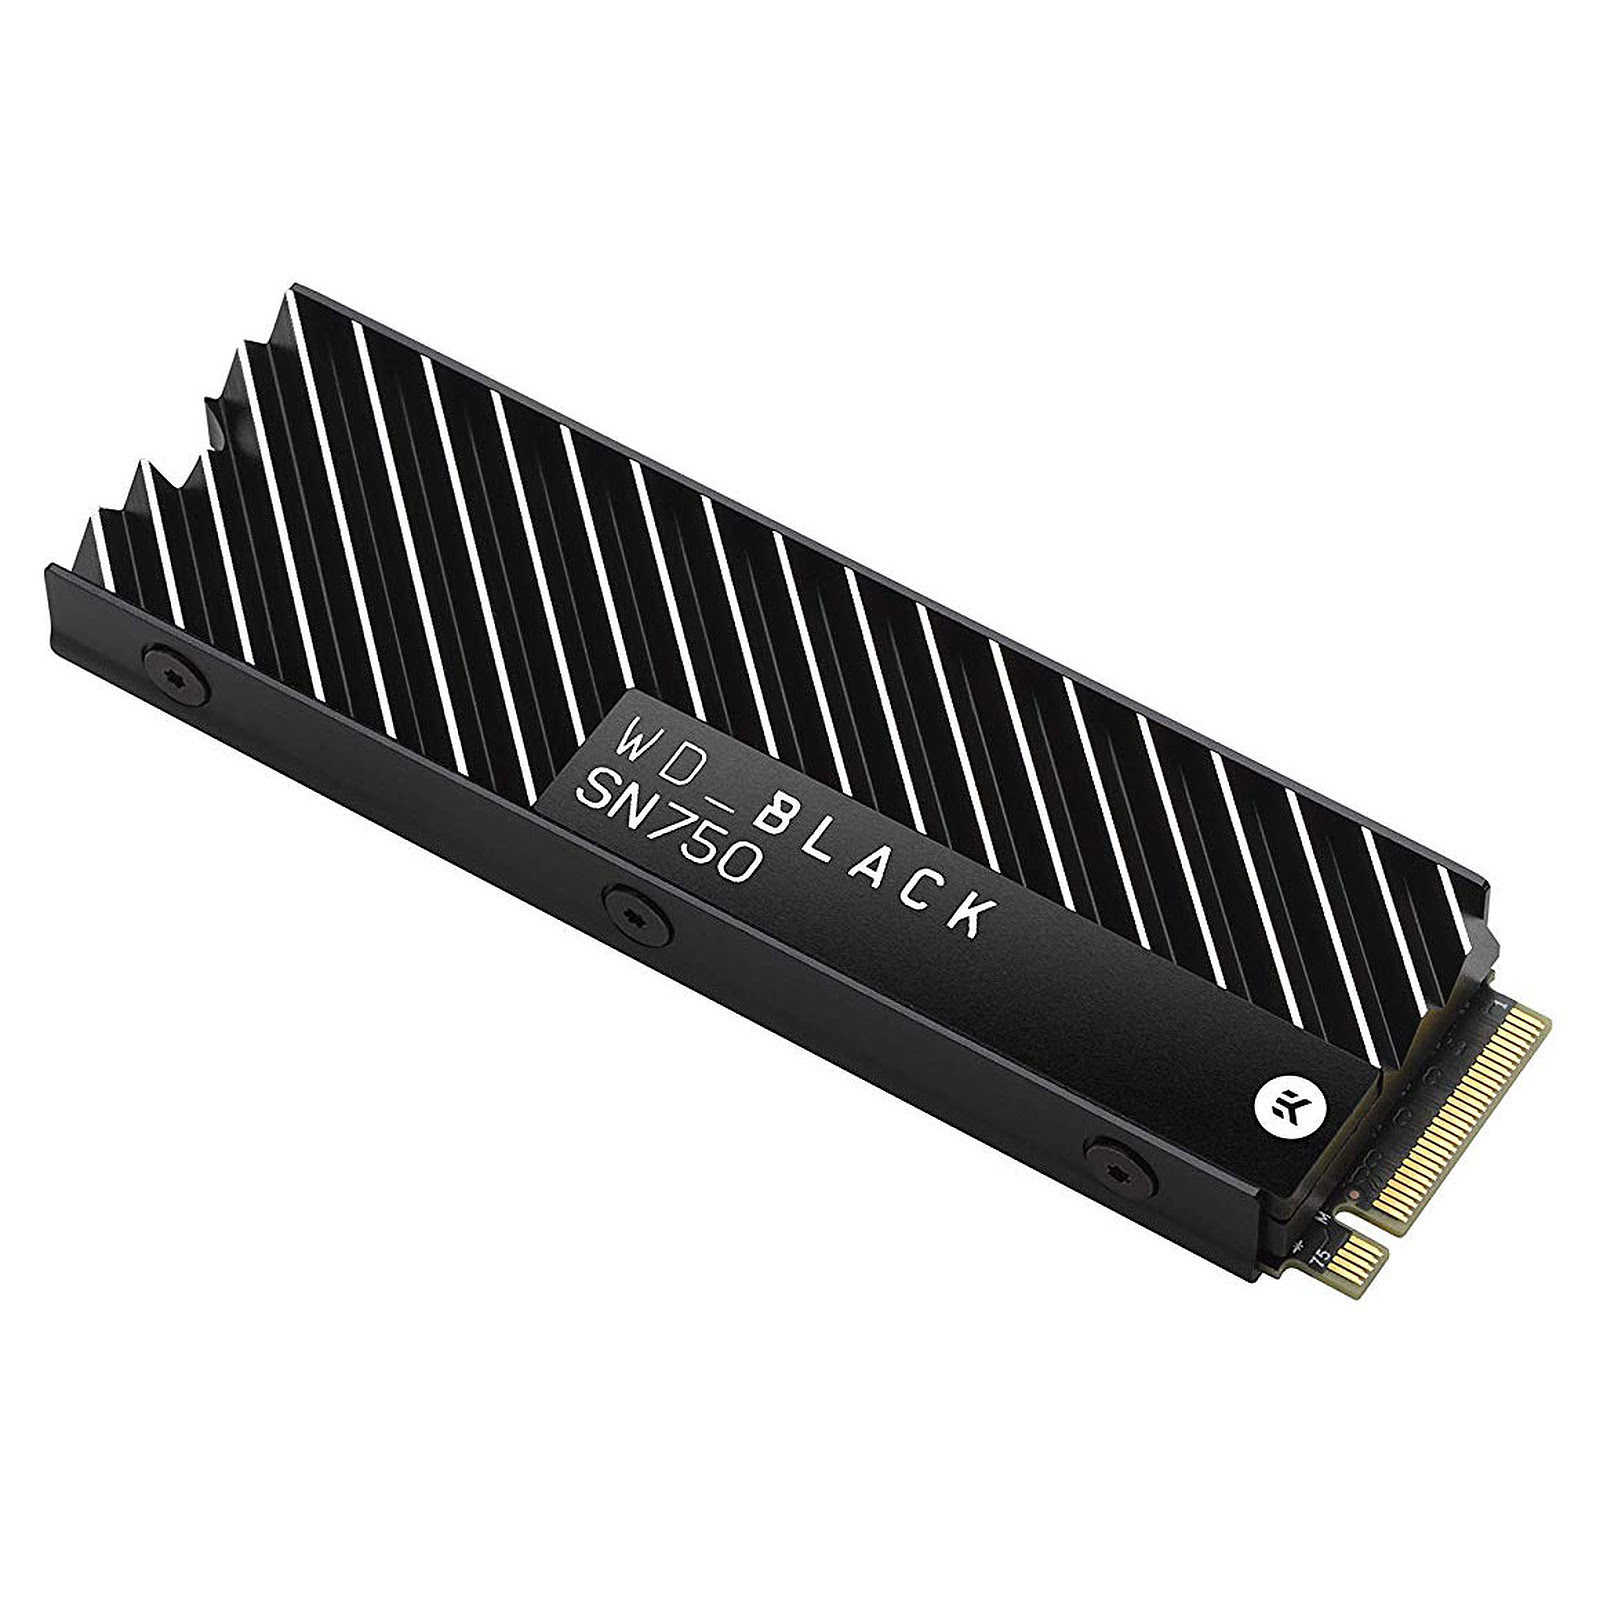 WD WDS500G3XHC 480-525Go M.2 - Disque SSD WD - Cybertek.fr - 1